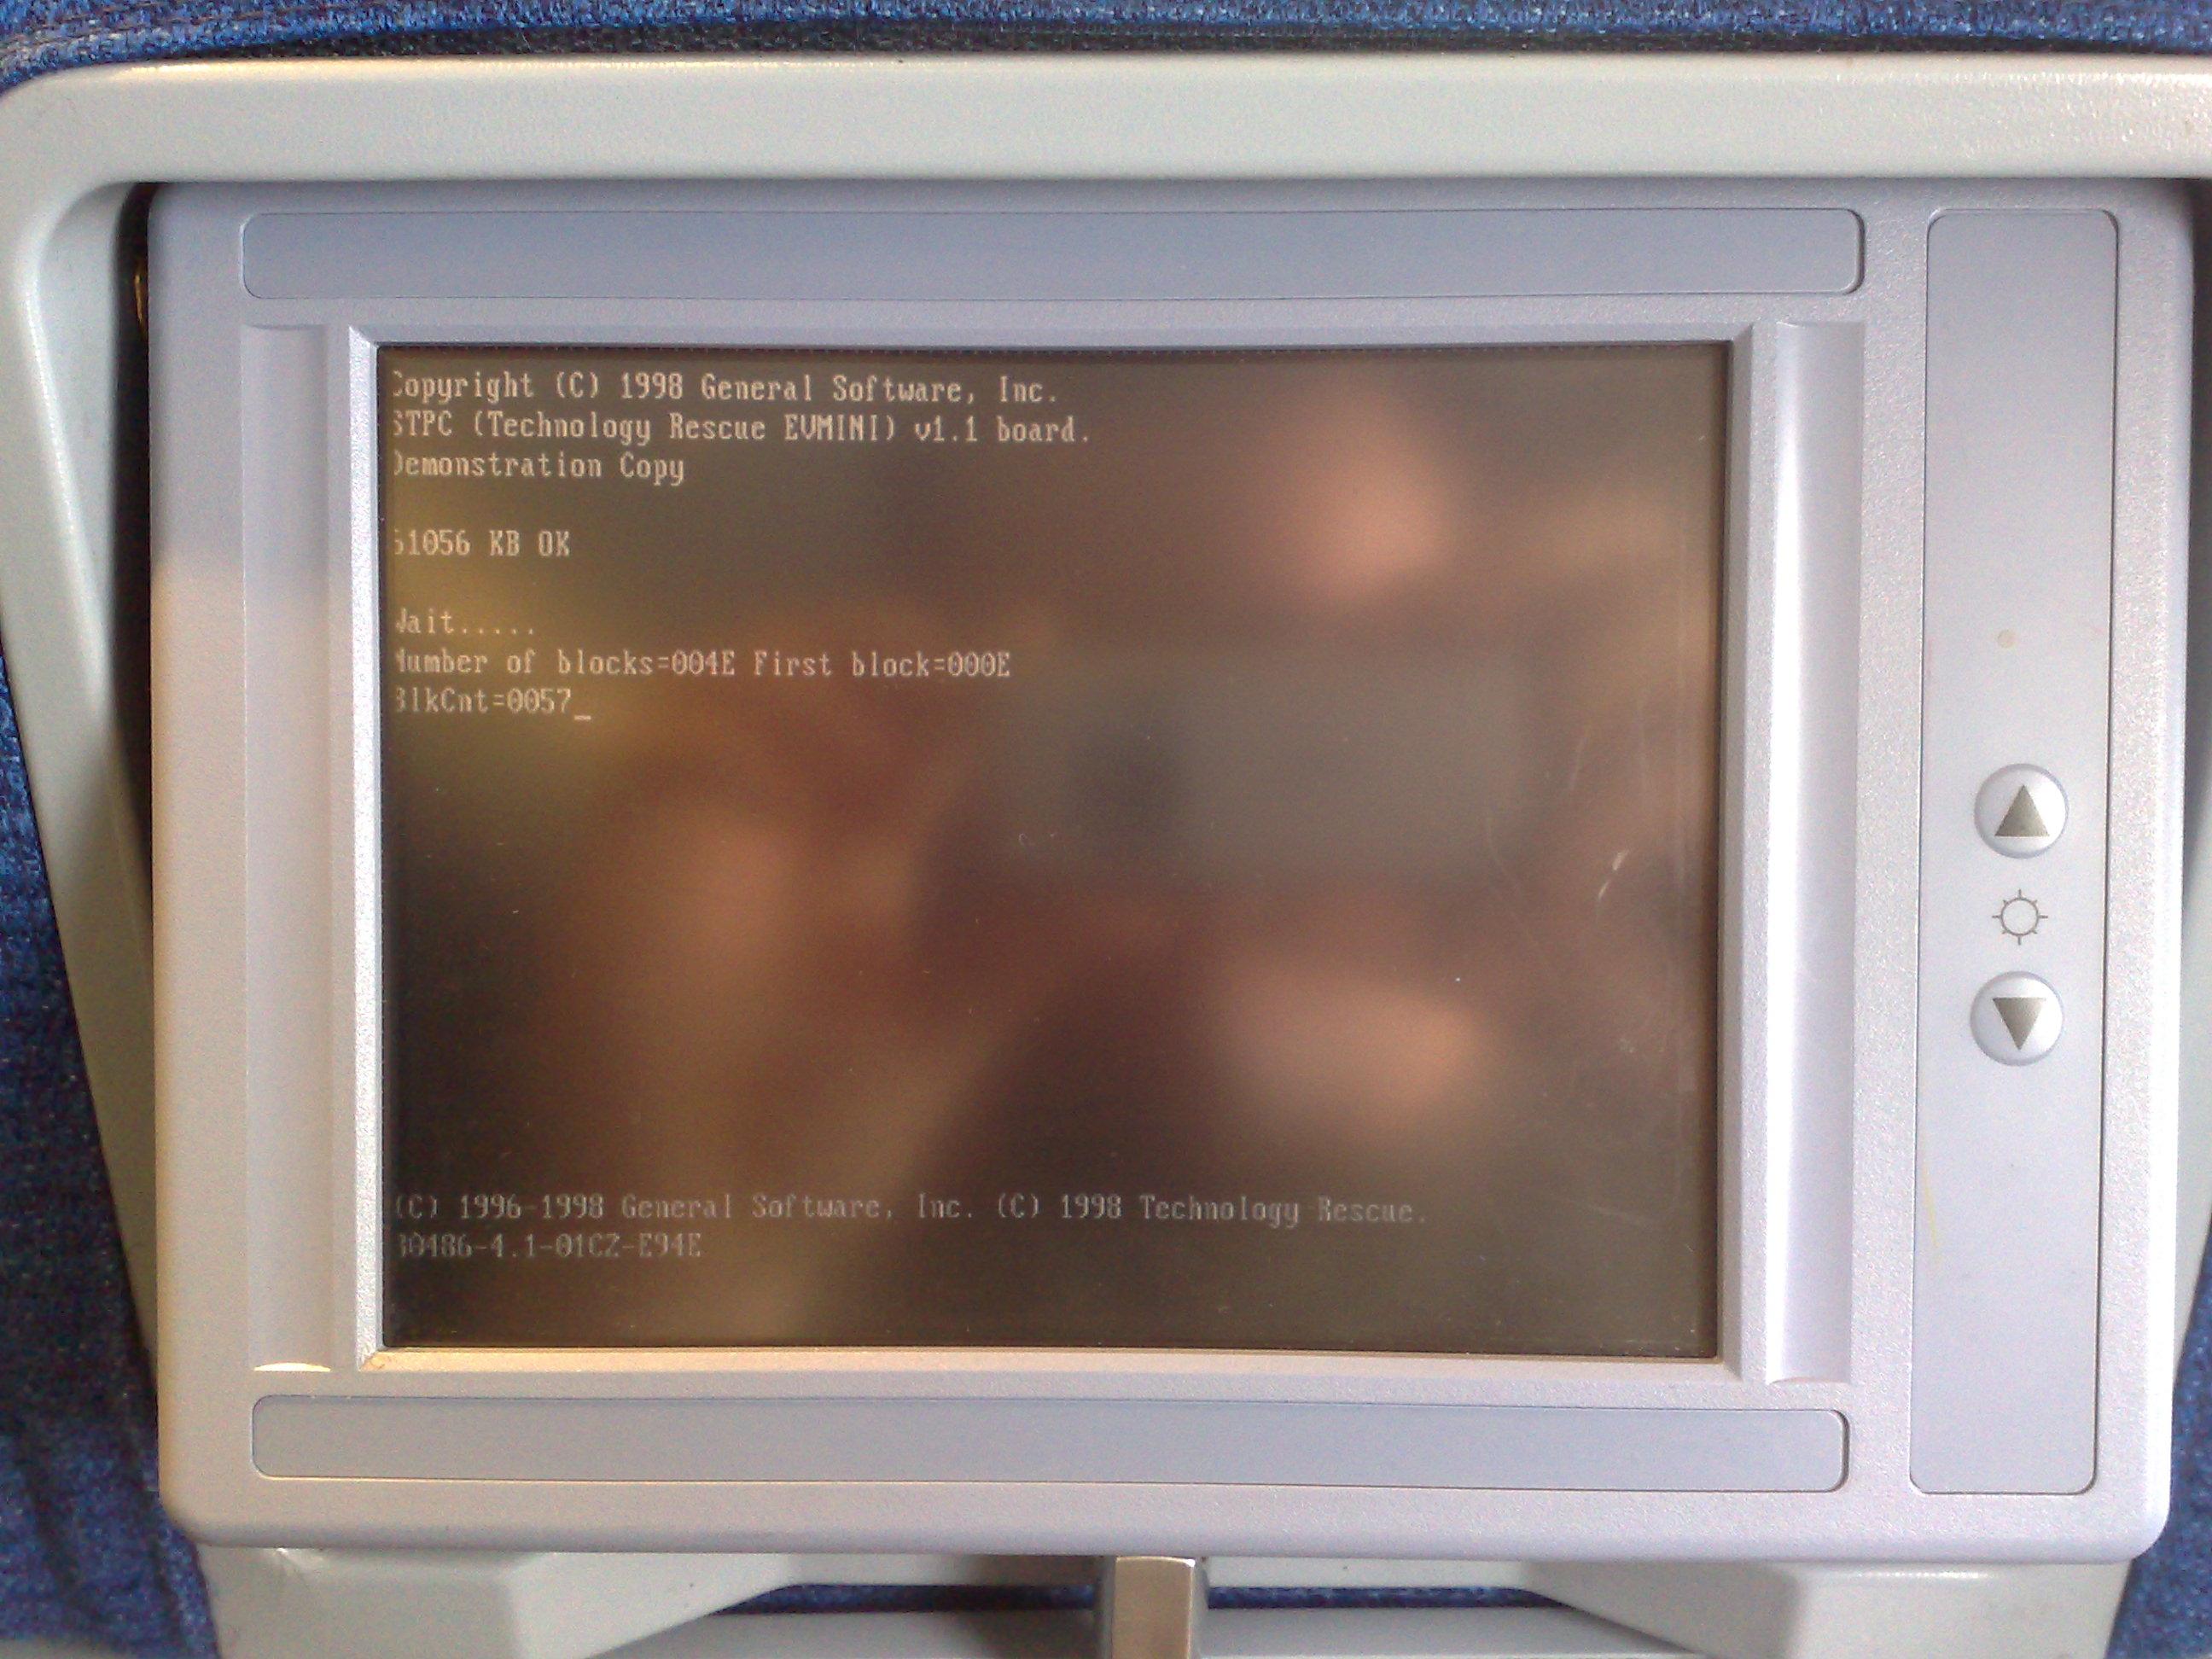 I Crashed the In-Flight entertainment - Demonstation Copy !!